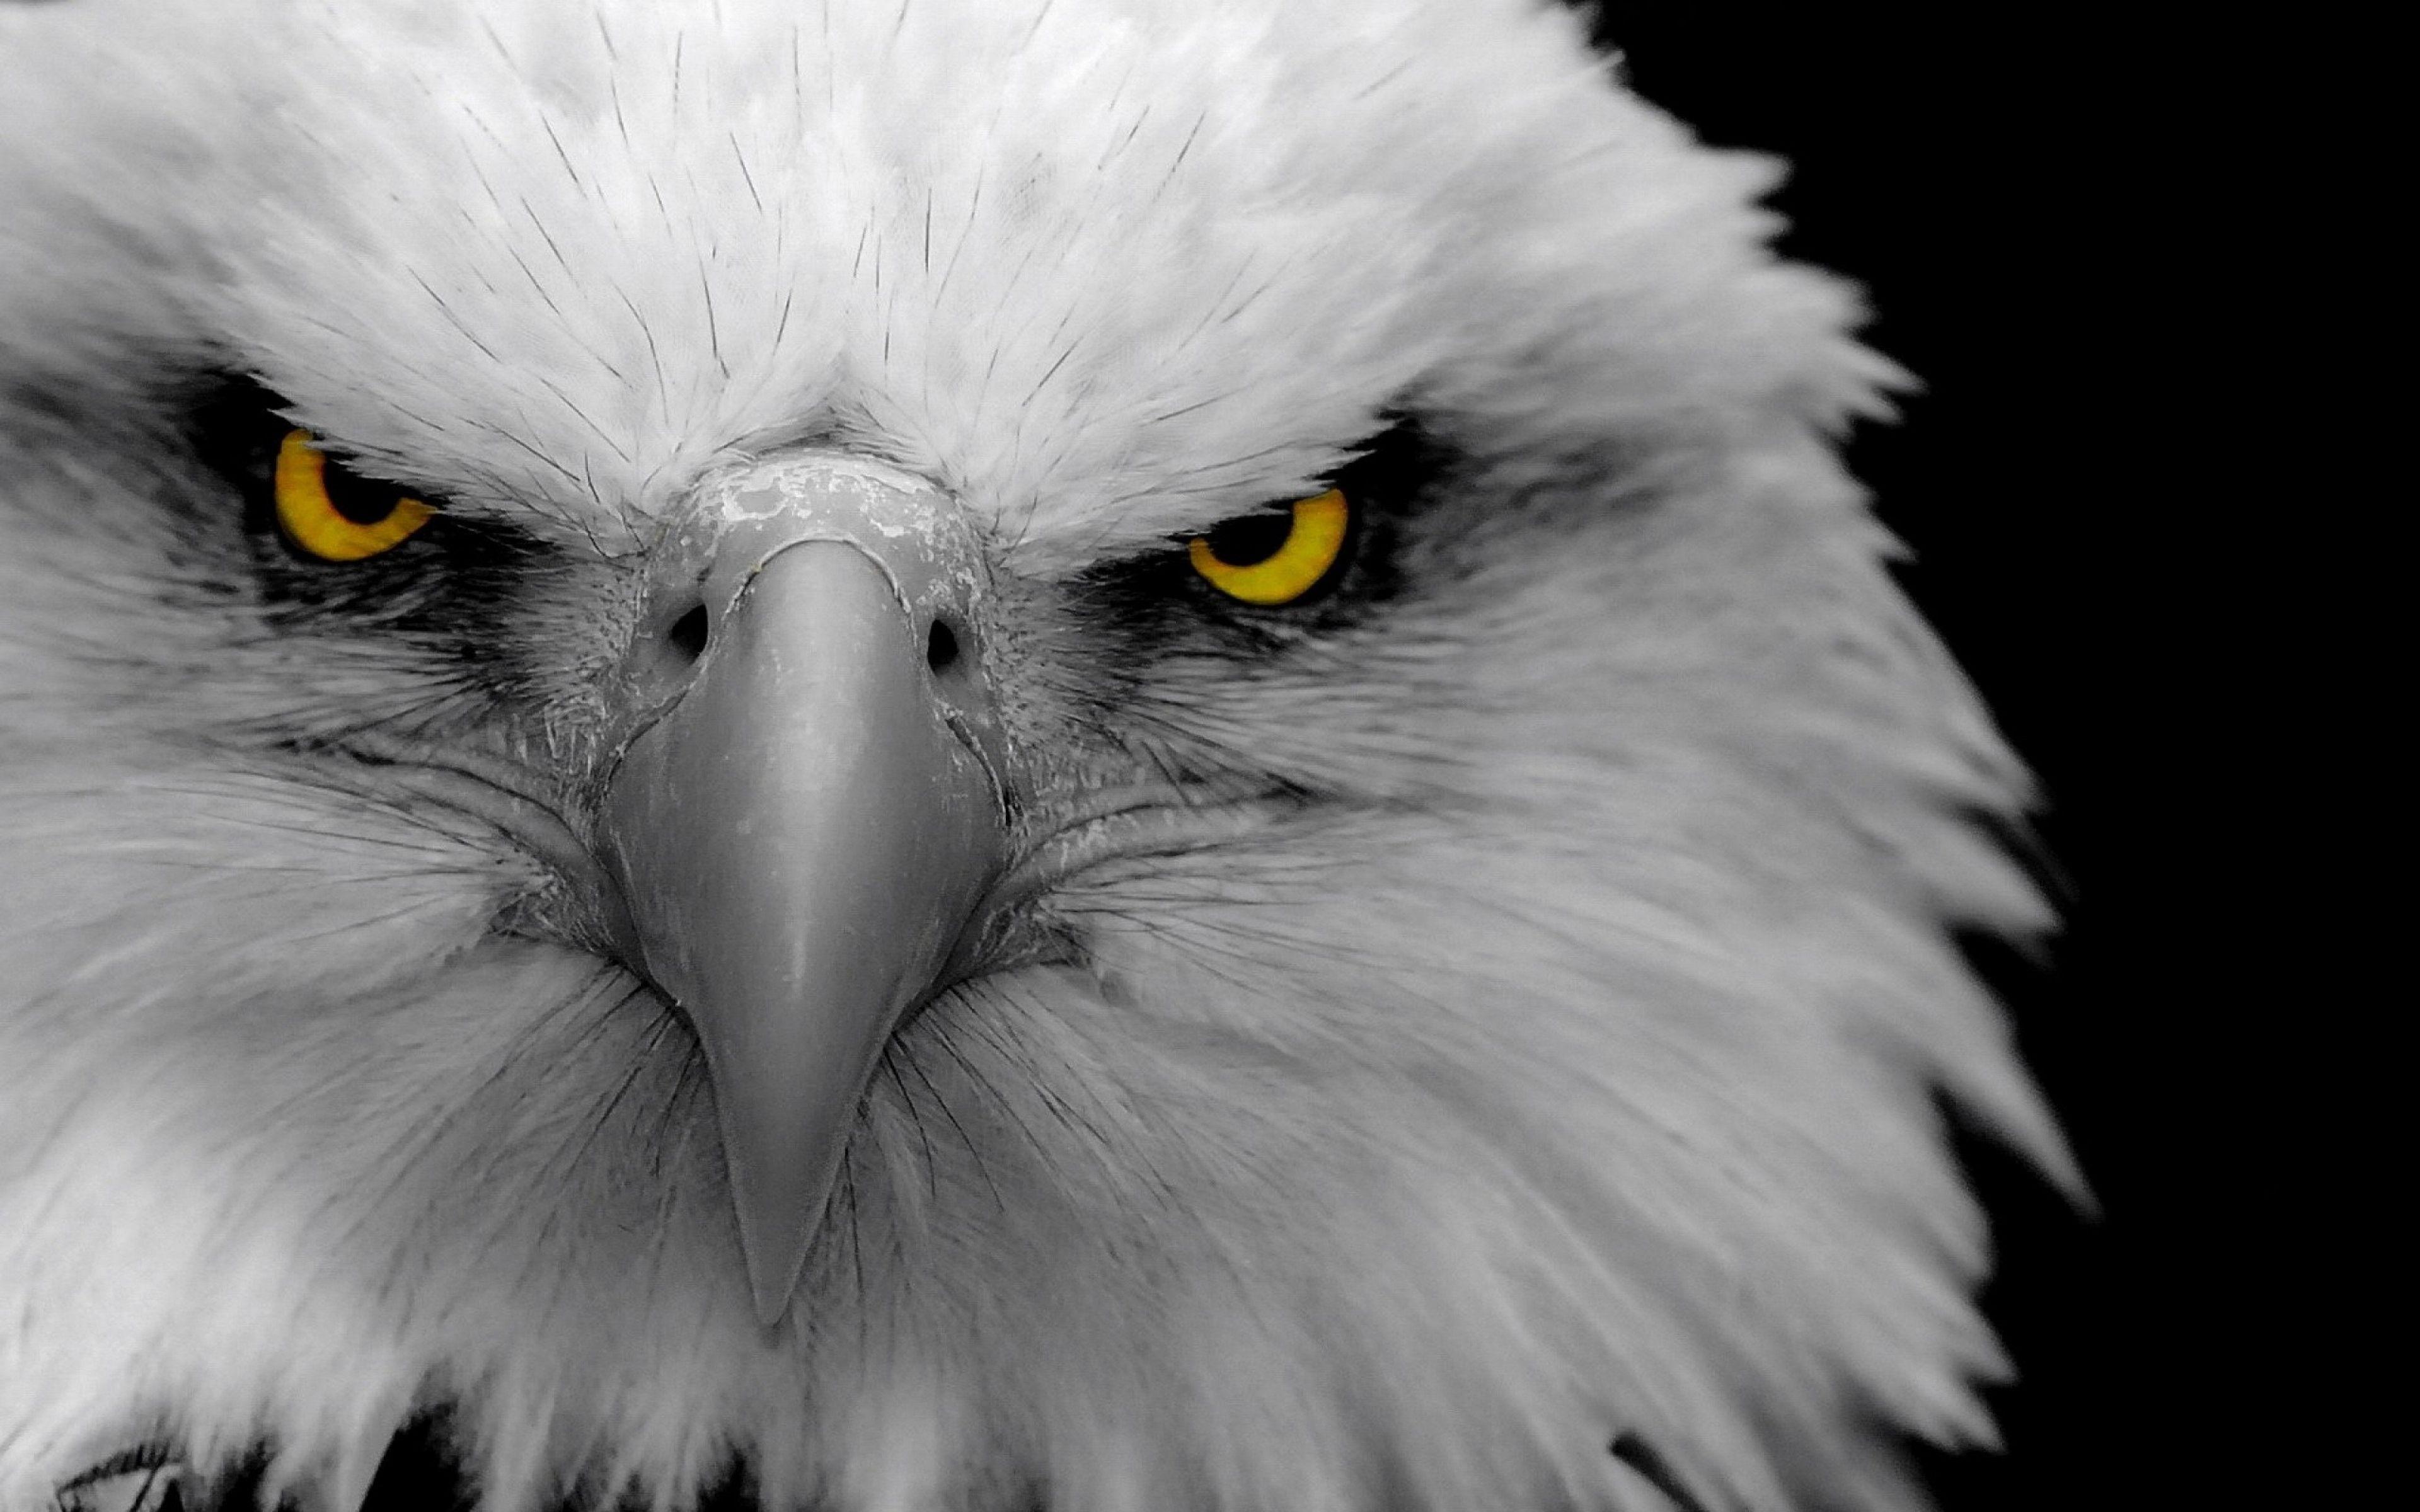 3840x2400 Eikones Mayroy Aetoy Kai Eikones Fontoy Stmed Net Eagle Wallpaper Bald Eagle Pet Portraits Photography Eagle black and white hd wallpaper